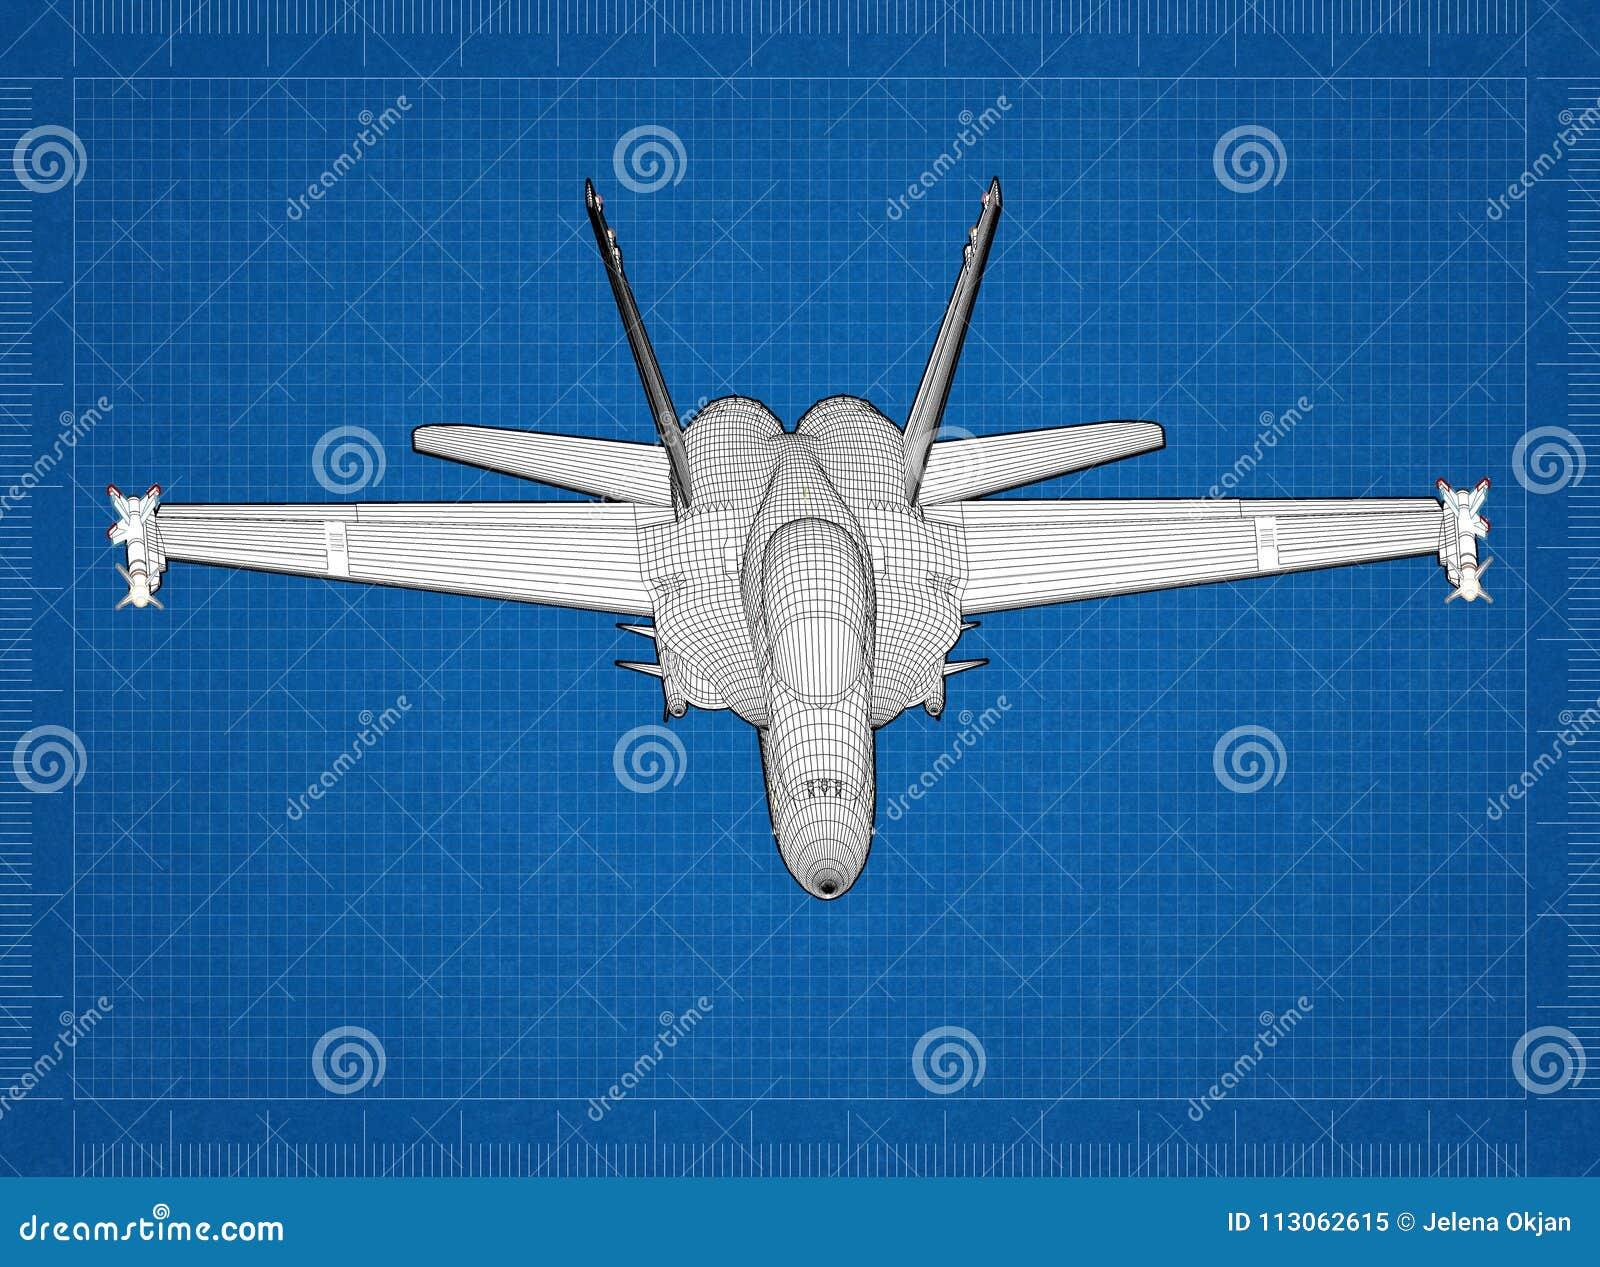 Military Plane 3D Blueprint Stock Image - Image of blue, machine